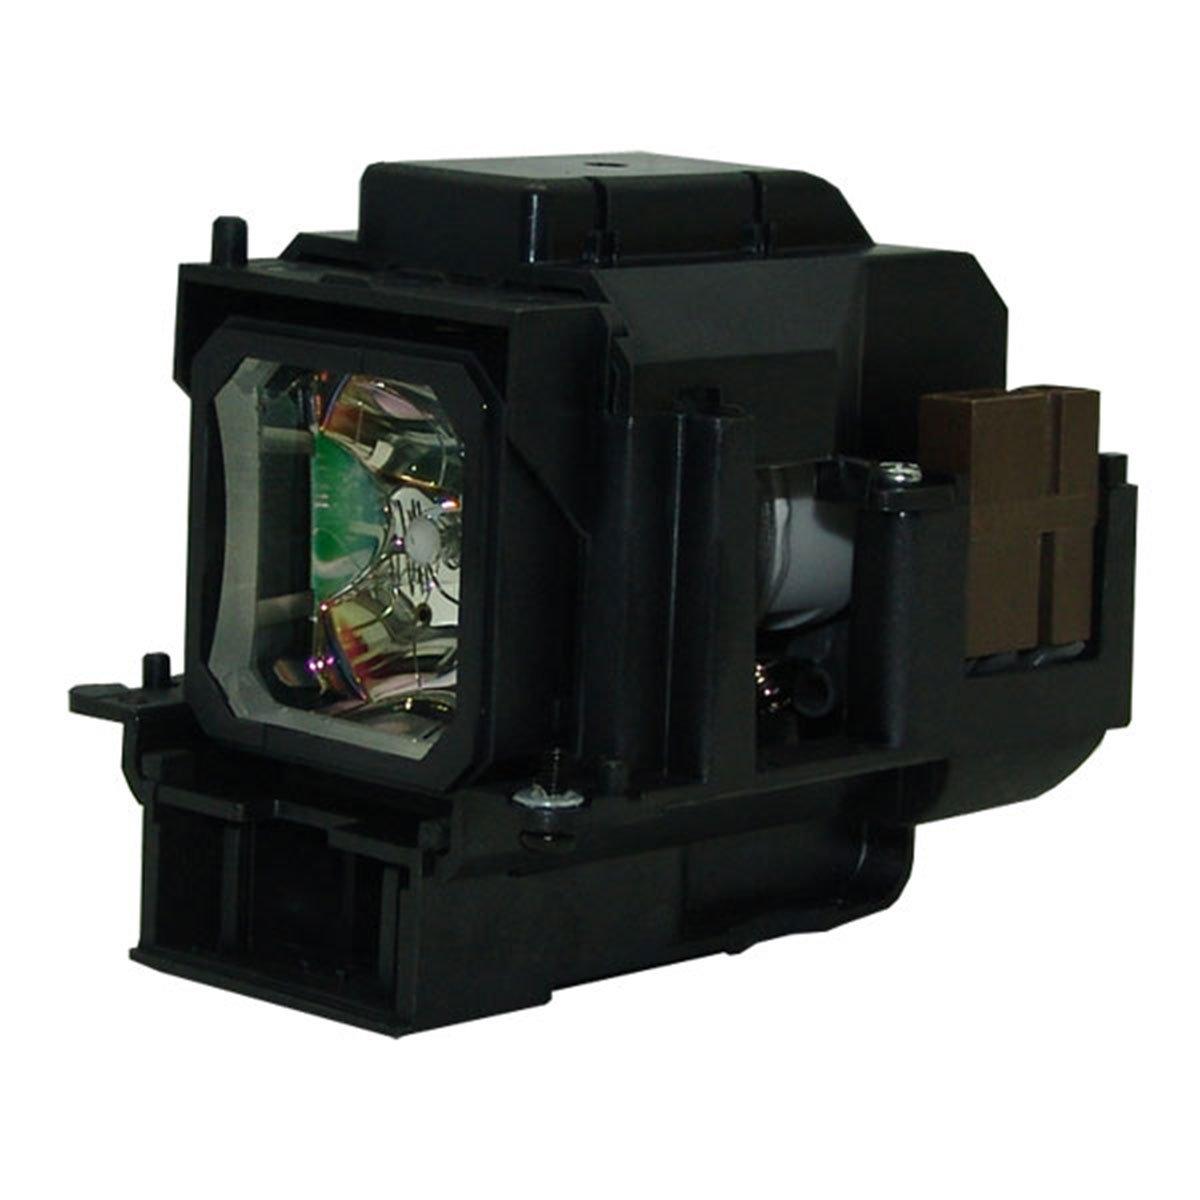 AuraBeam Professional Dukane Image Pro 8769プロジェクタ用交換ランプハウジング( Powered by Ushio )   B0143M9TBQ